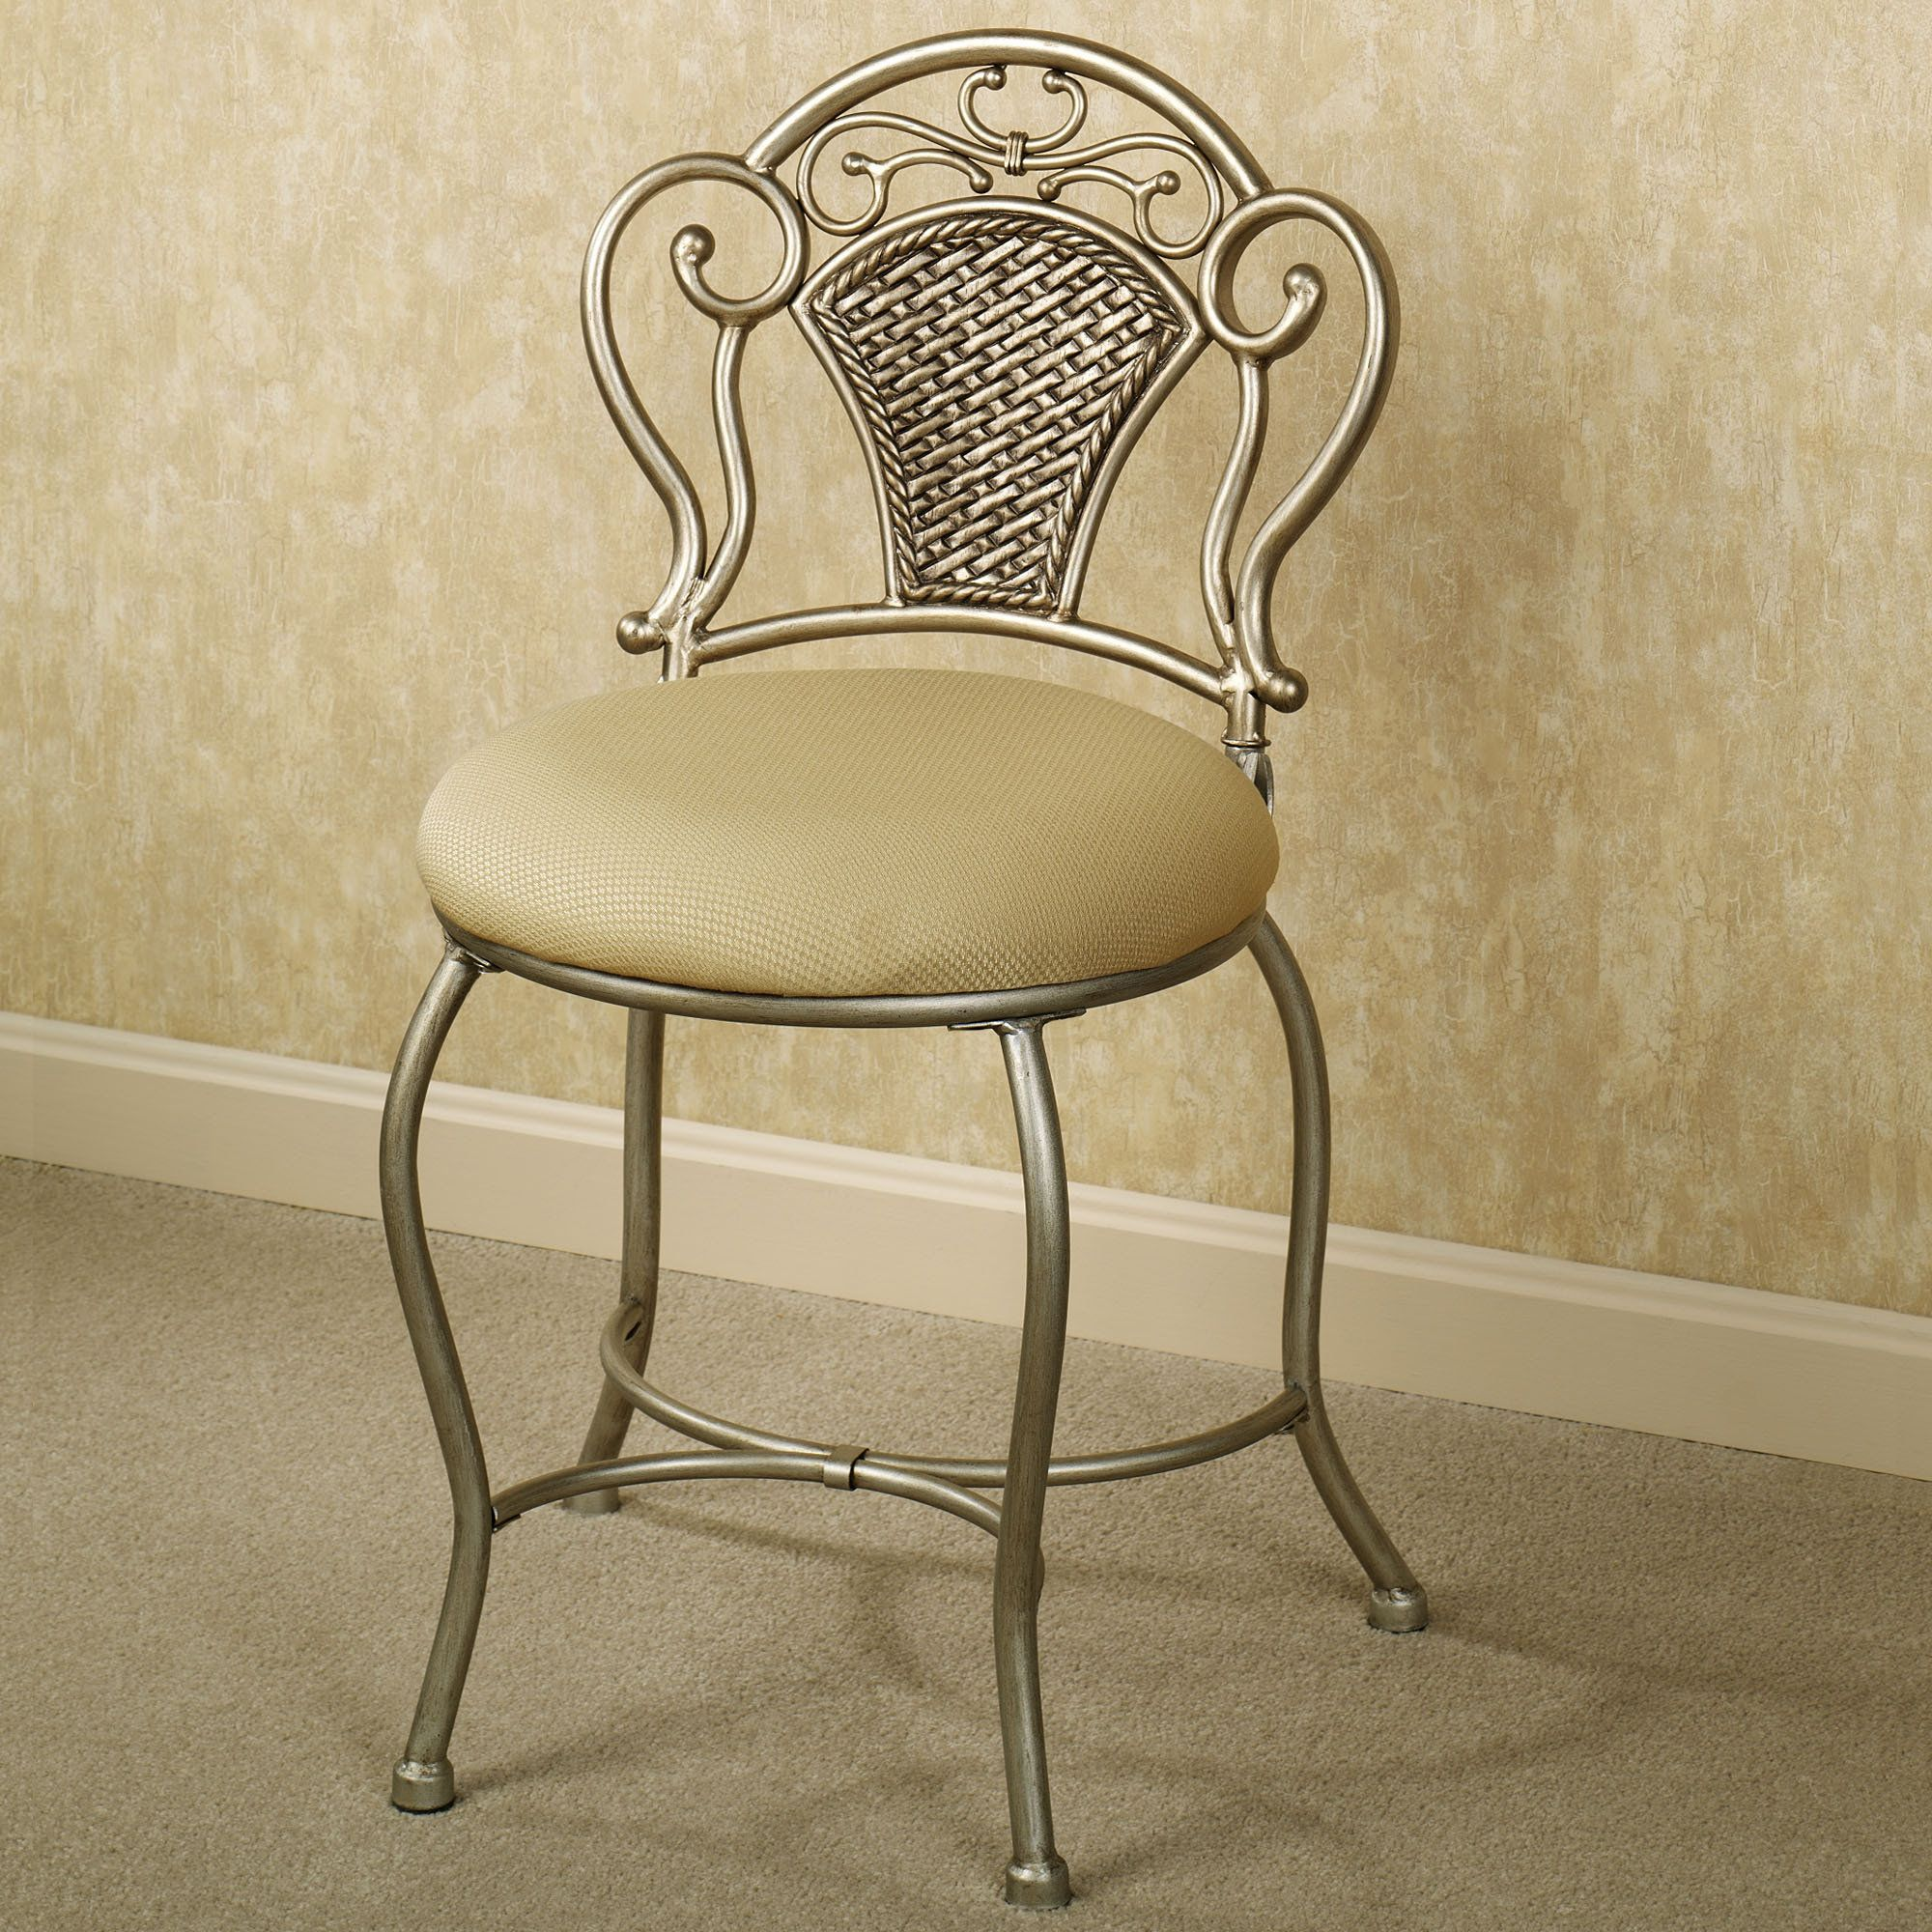 Tayla Vanity Chair With Images Vanity Chair Vanity Seat